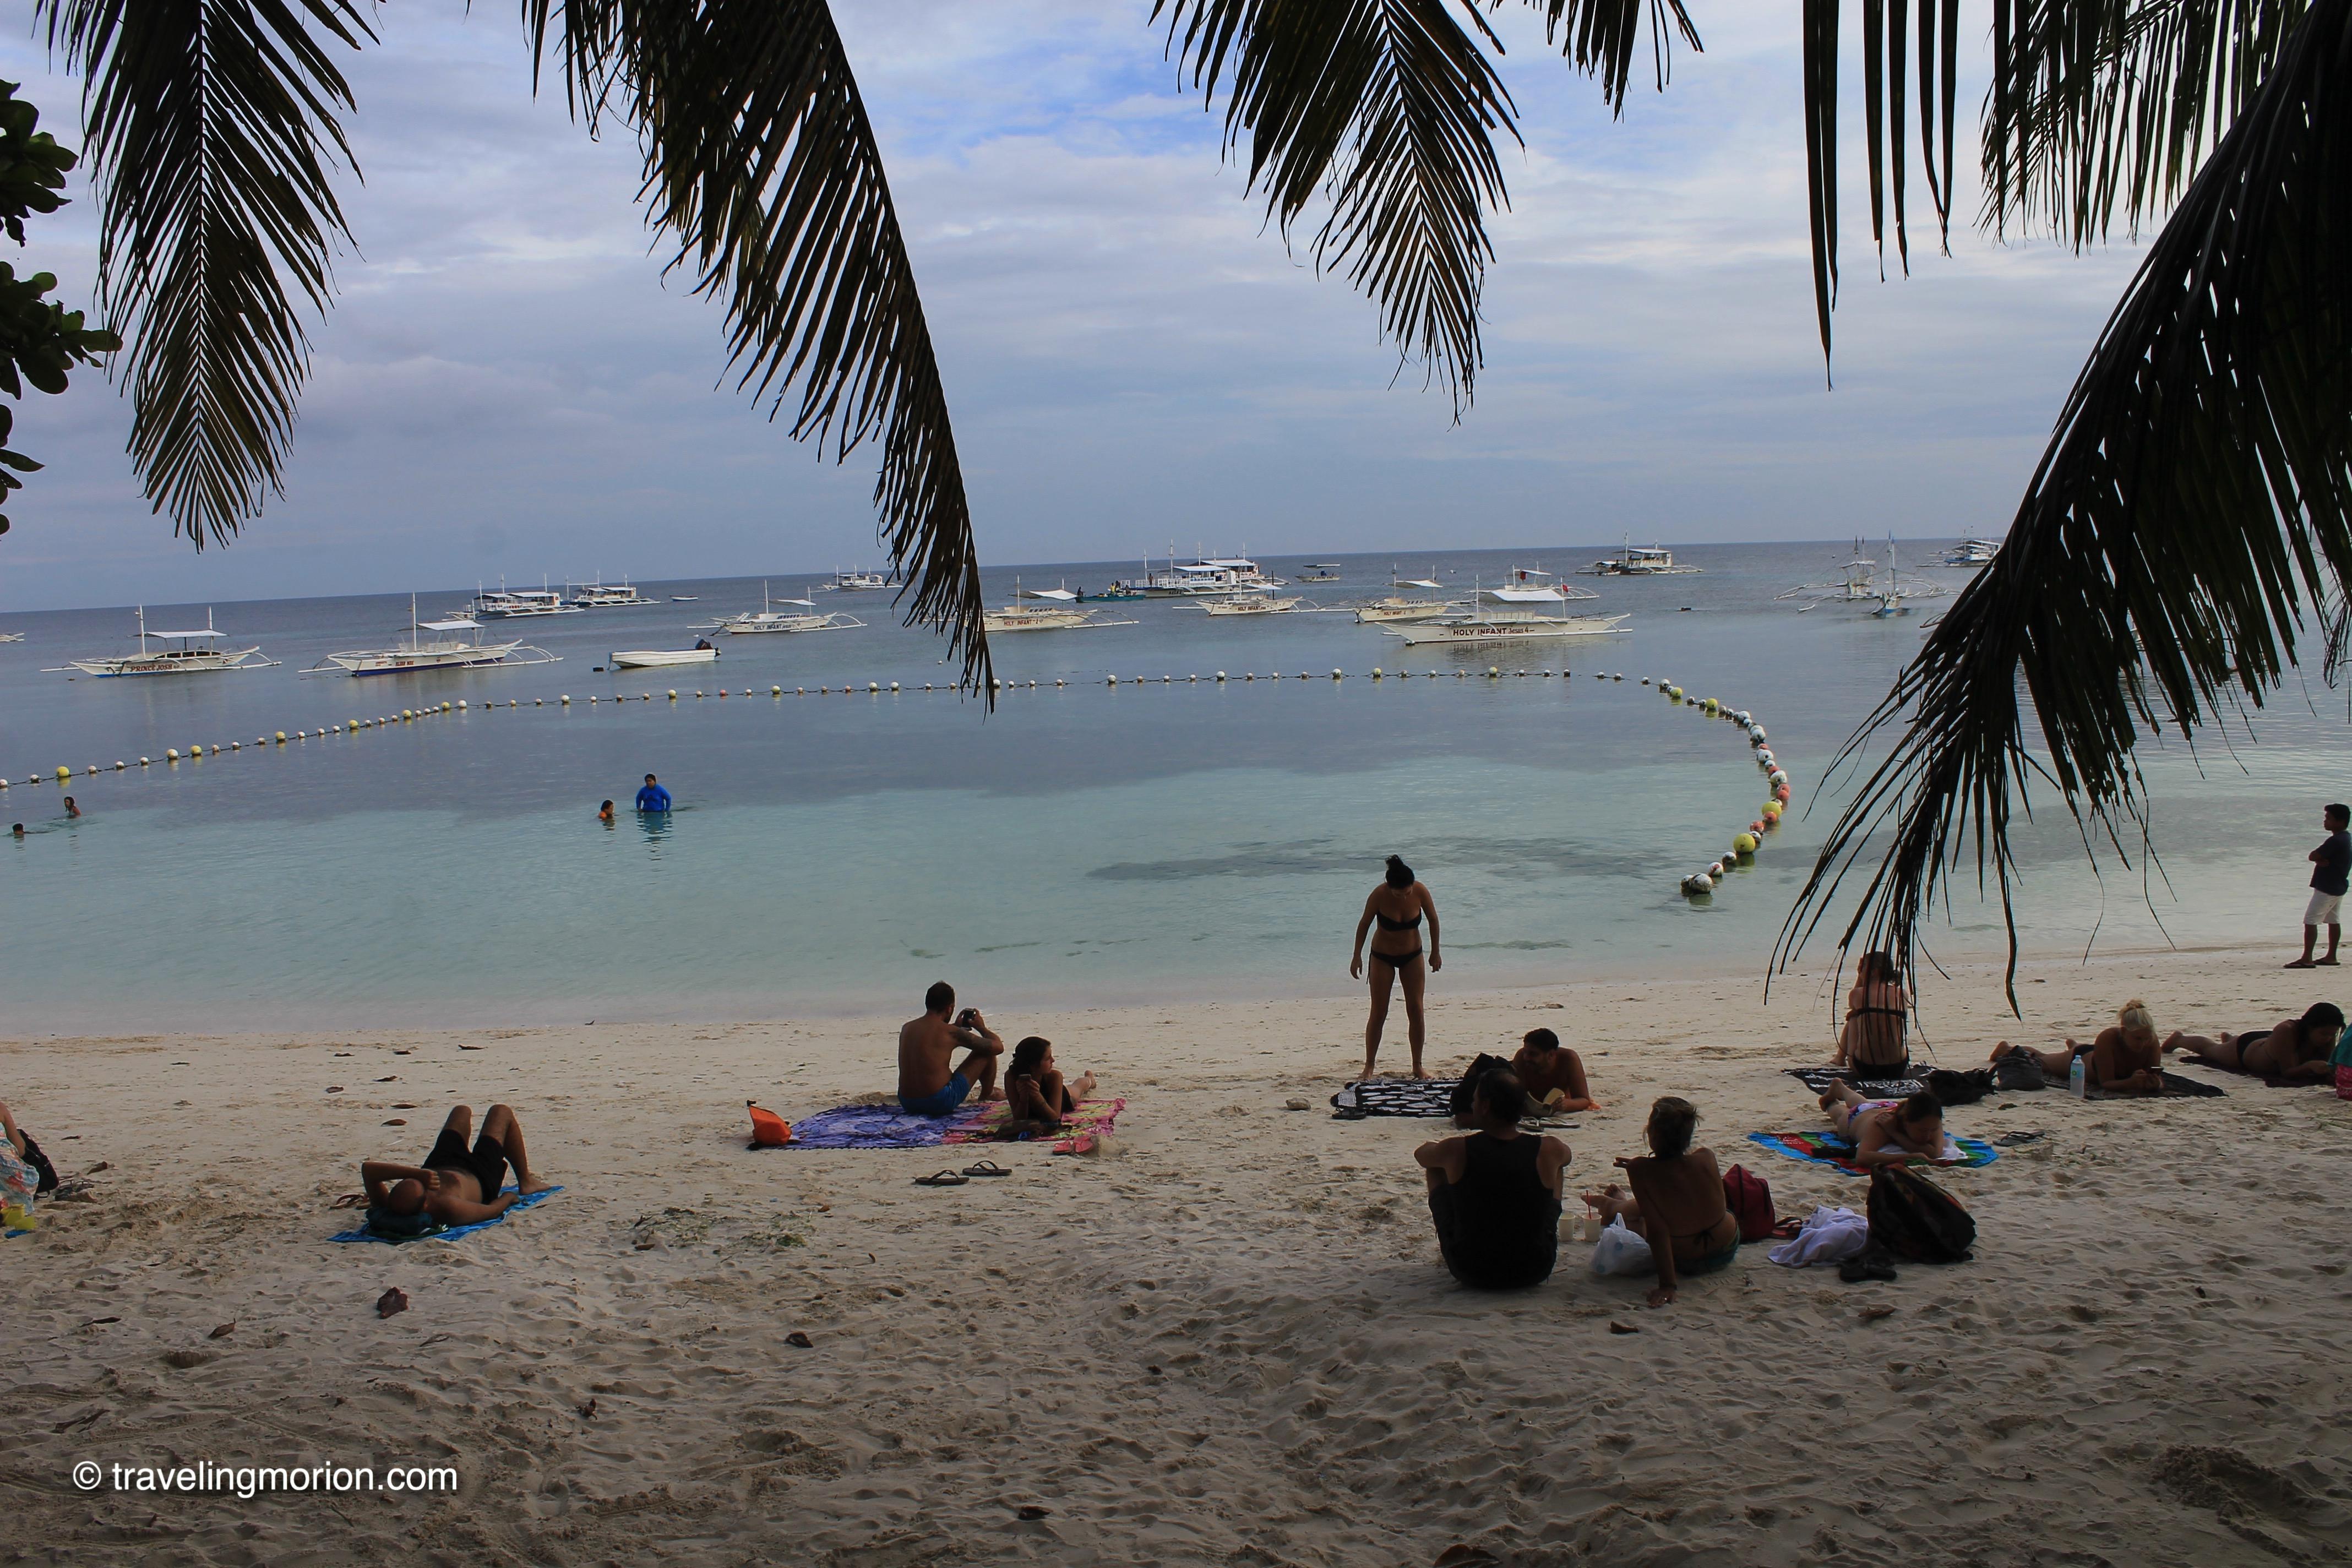 Alona Beach in Panglao, Bohol